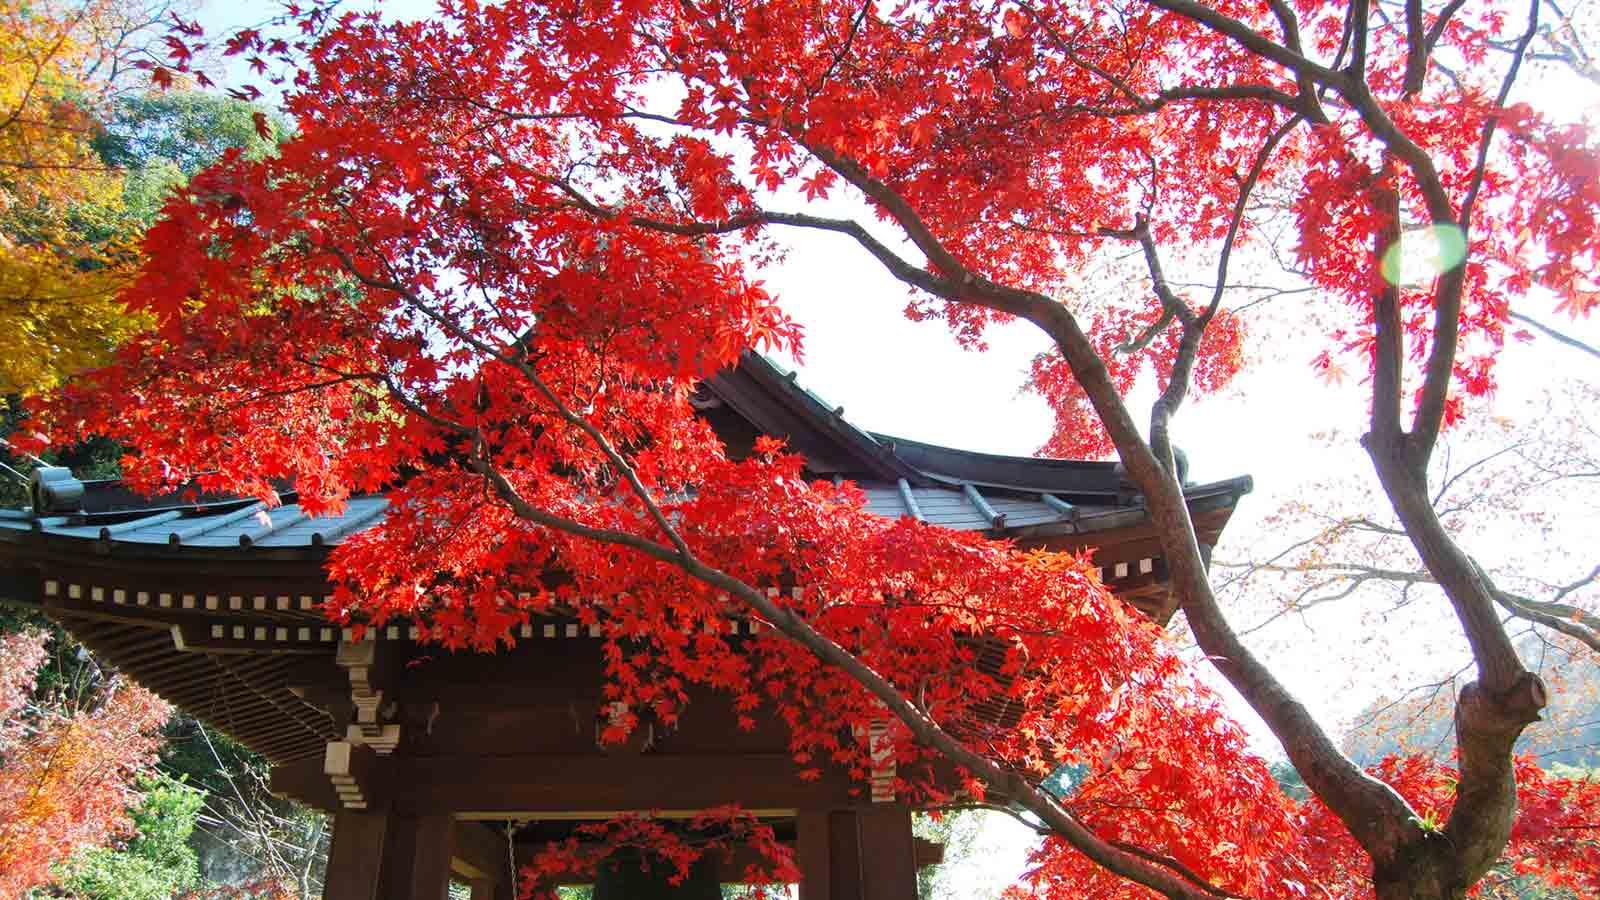 Wallpaper Fall Farmhouse 【红叶】武家古都镰仓的寺院神社